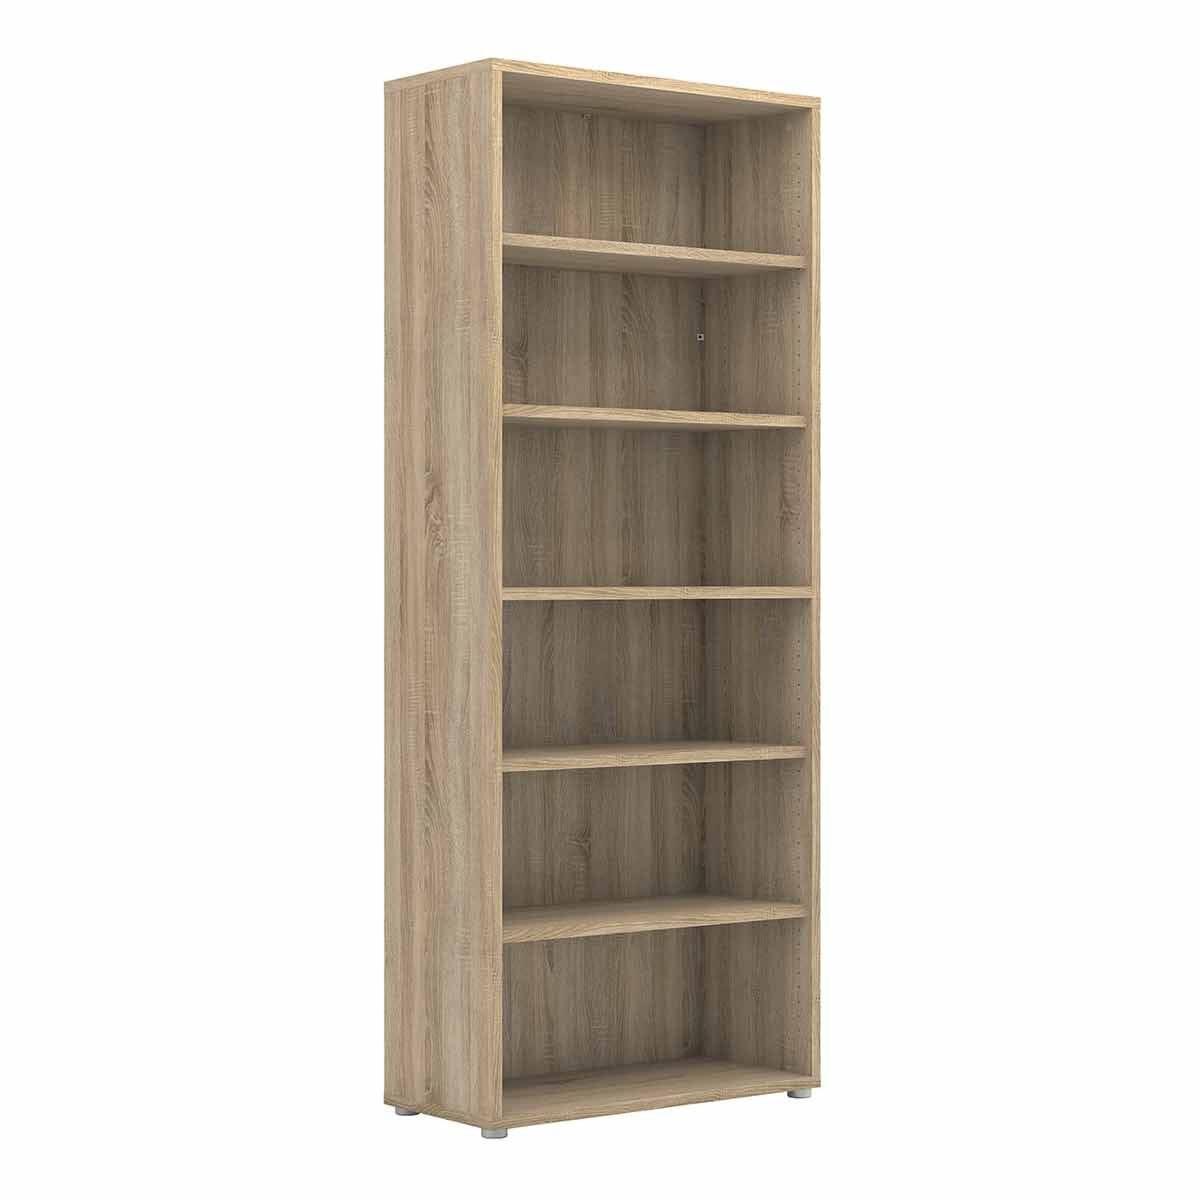 Prima Bookcase with 5 Shelves in Oak Oak